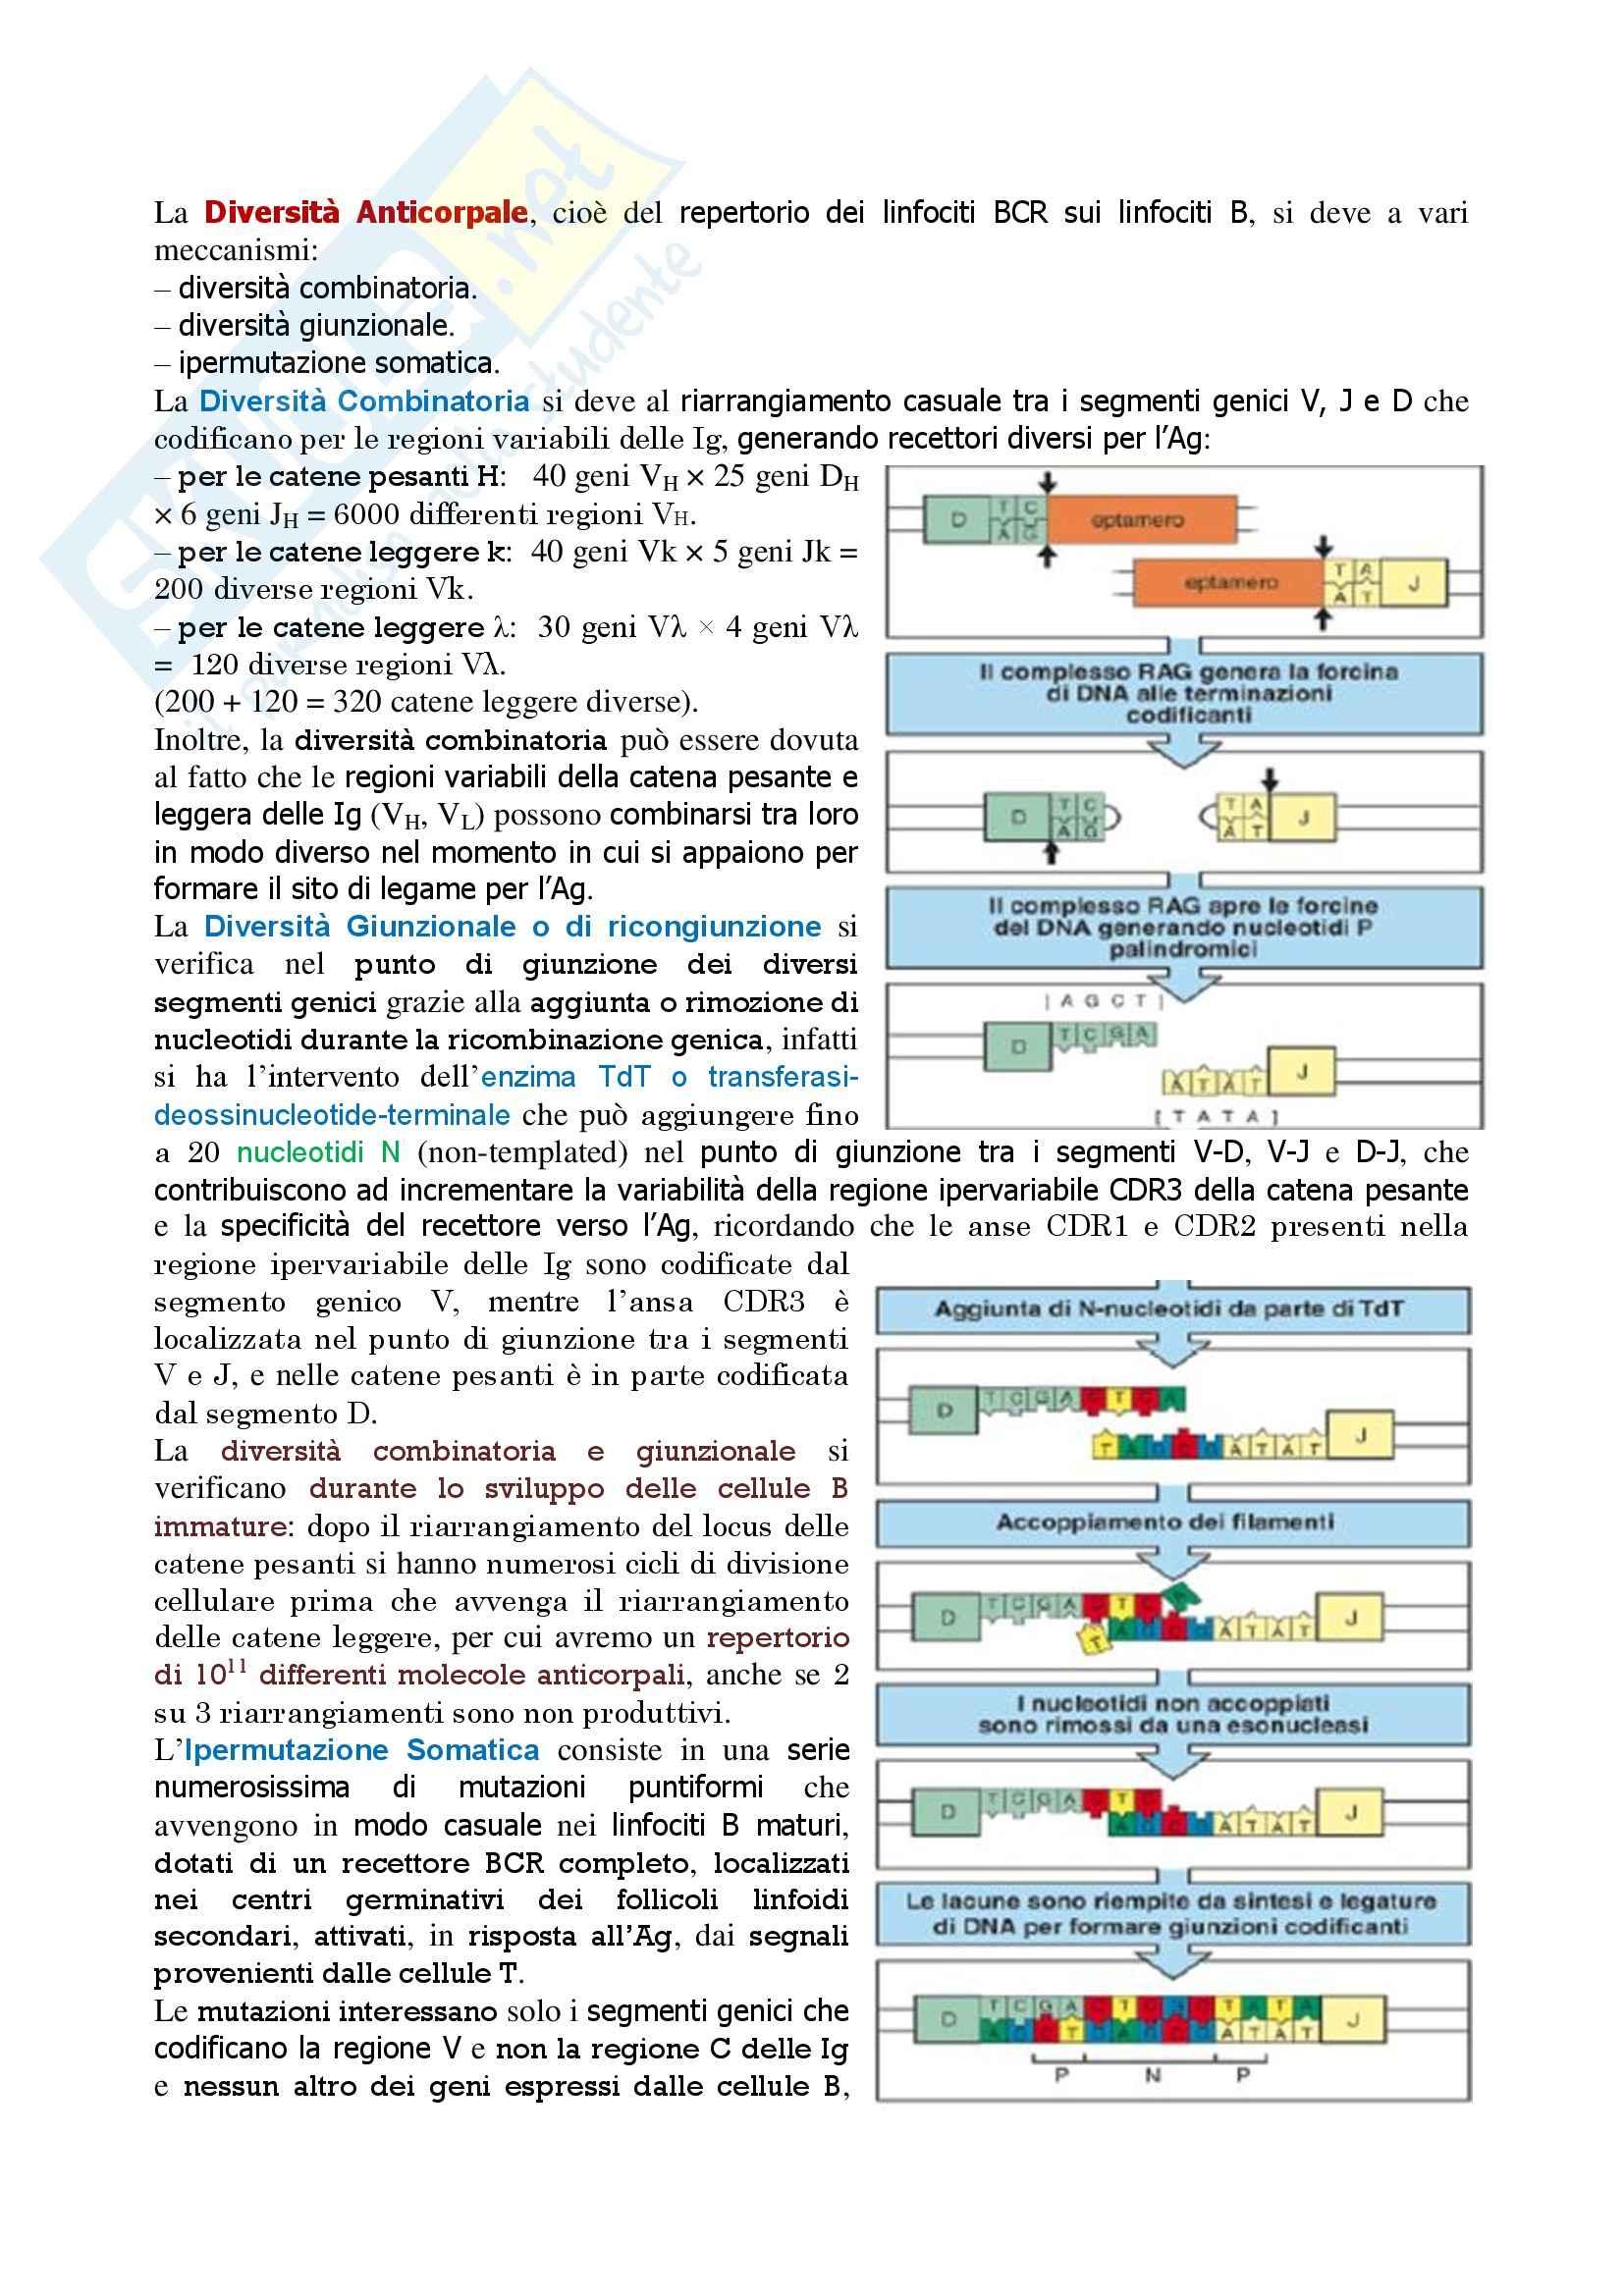 Immunologia – diversità anticorpale